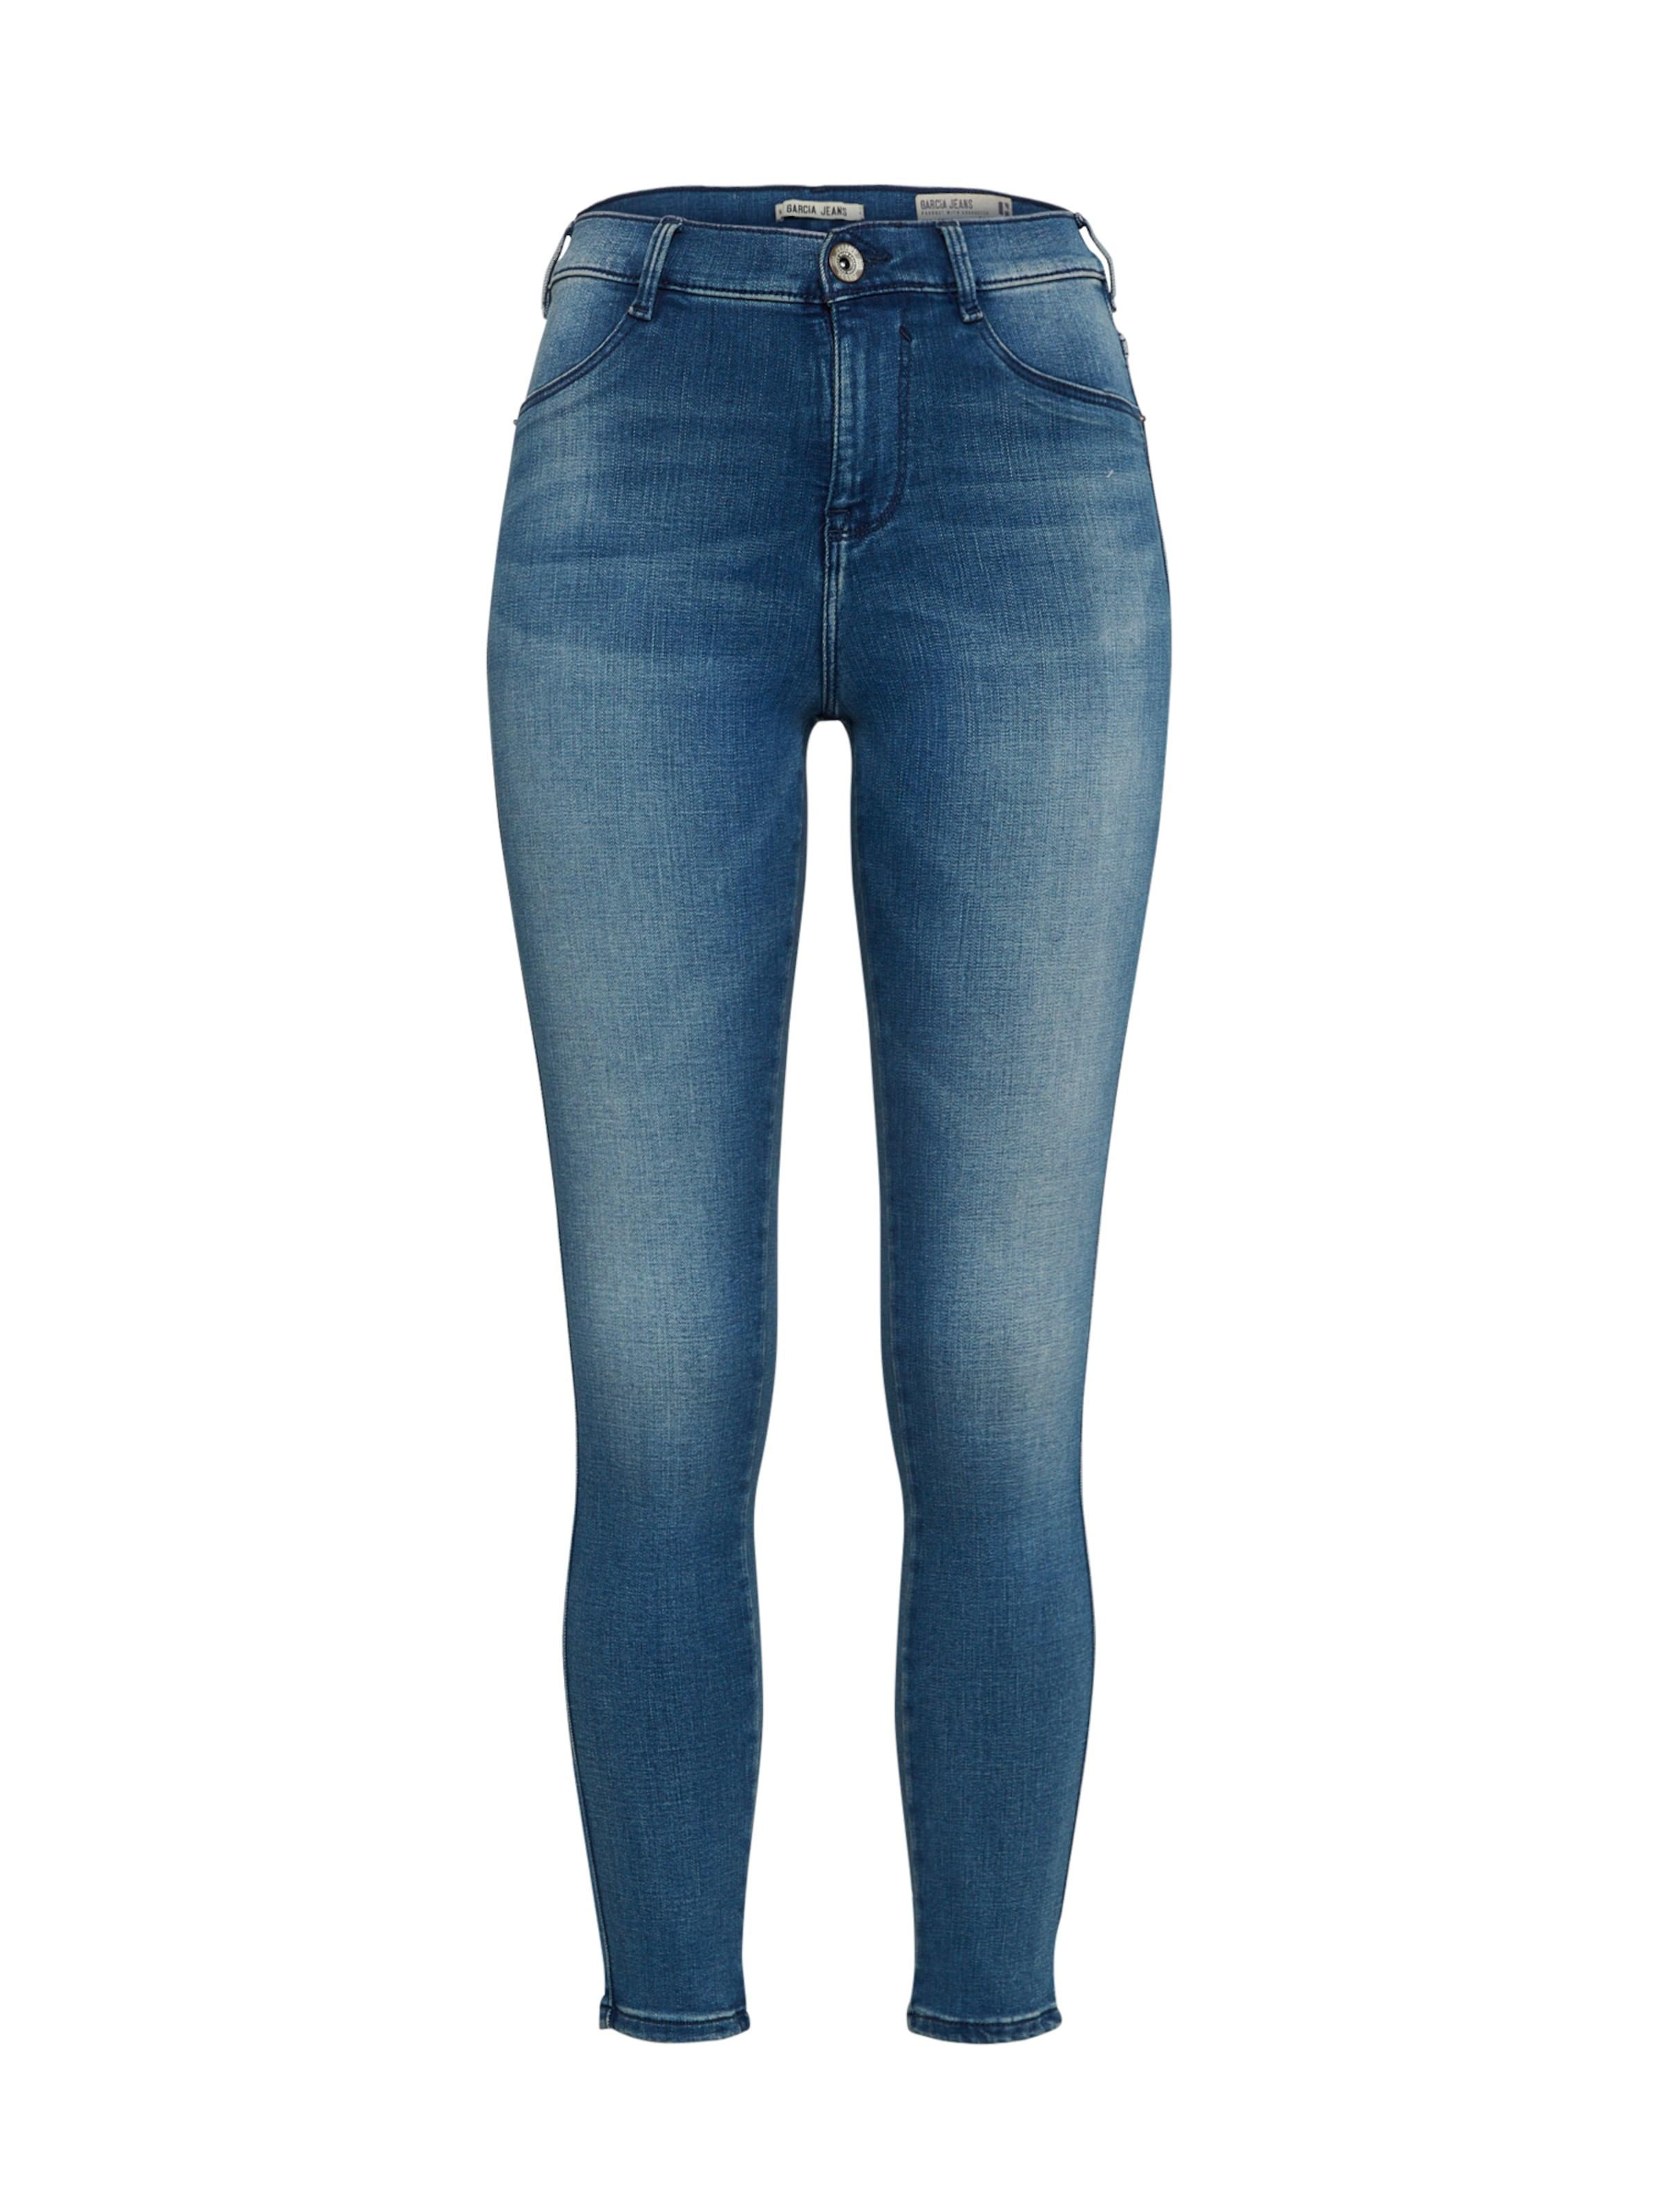 Garcia In Denim 'geena' Jeans Blue DE9WeHY2I